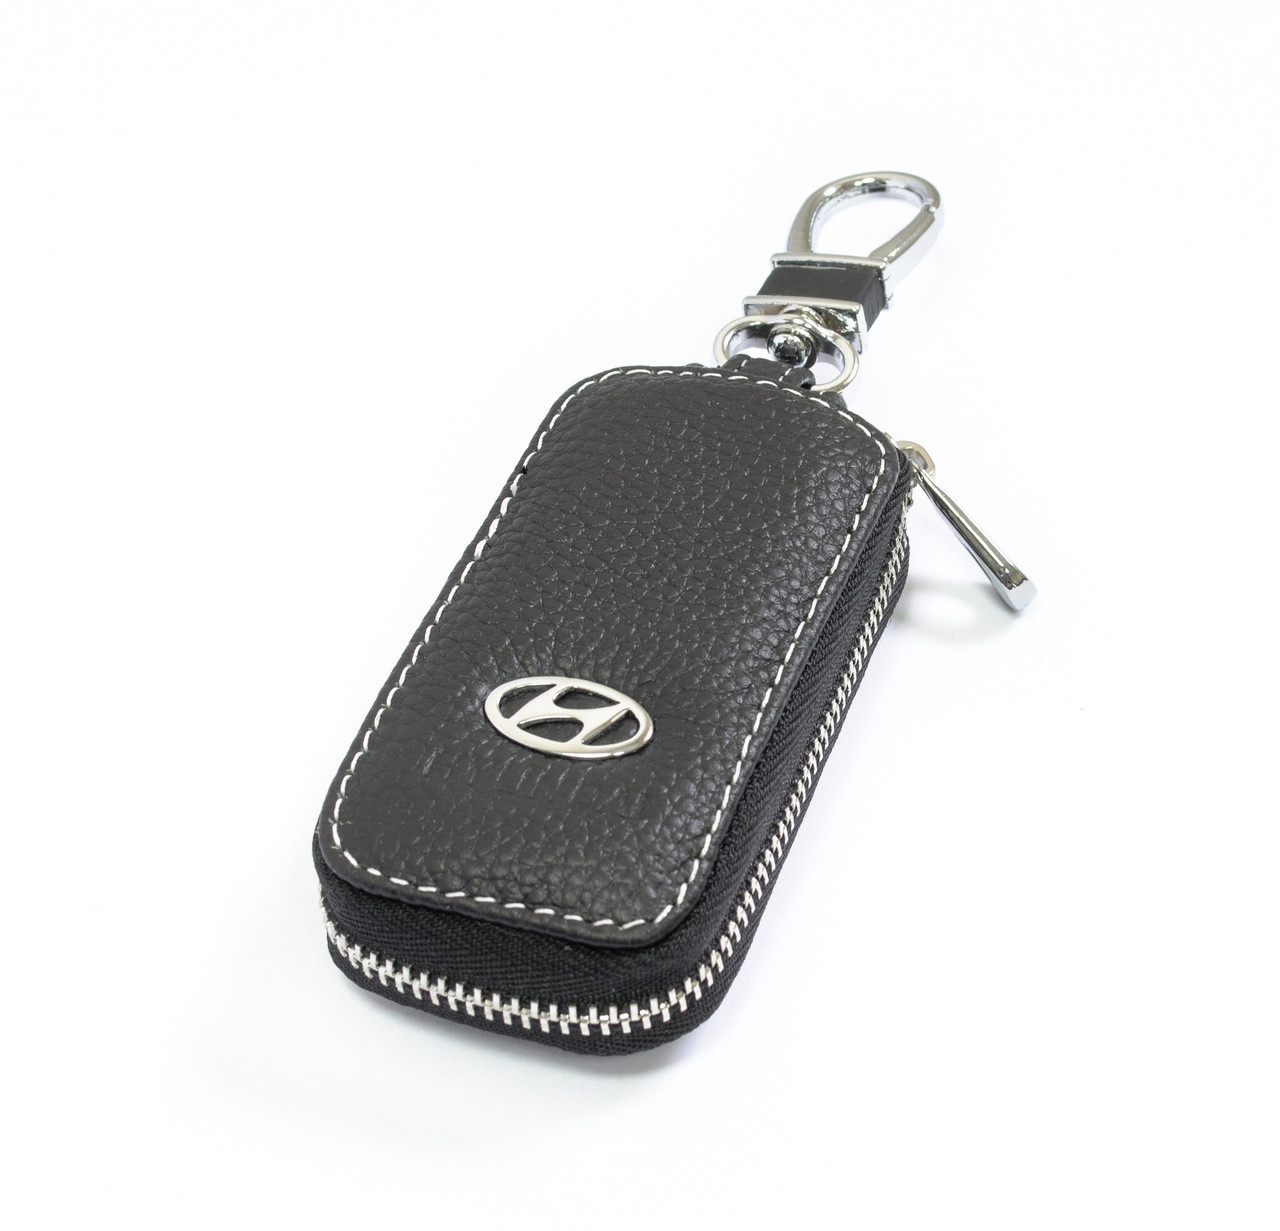 Ключница Carss с логотипом HYUNDAI 10010 черная